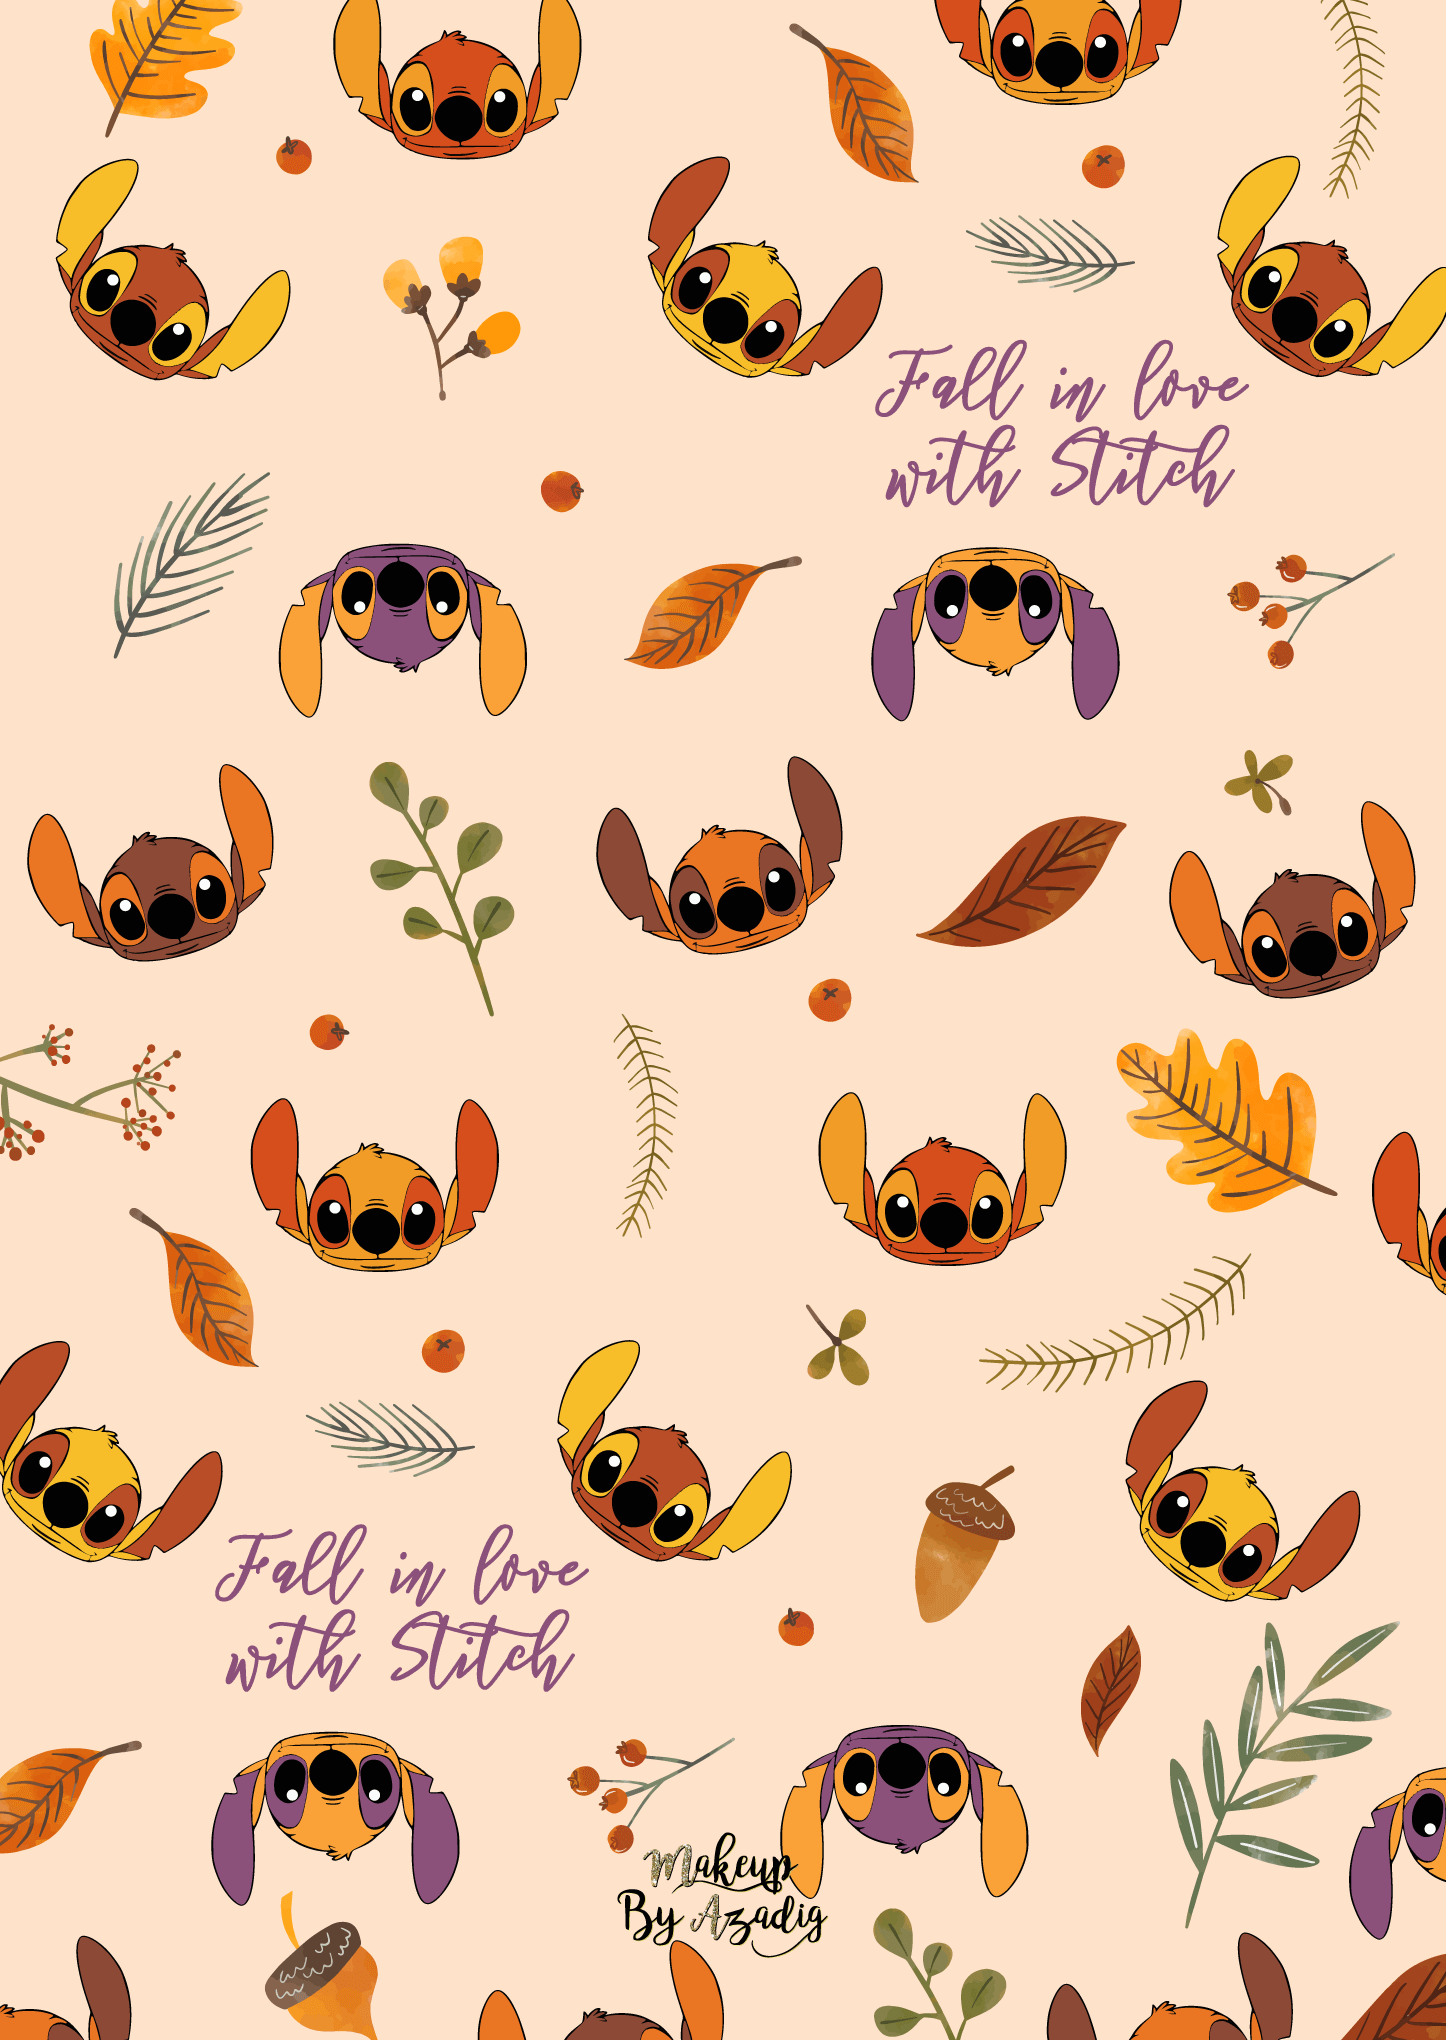 fond-decran-wallpaper-stitch-autumn-automne-fallinlove-disney-ipad-tablette-apple-makeupbyazadig-tendance